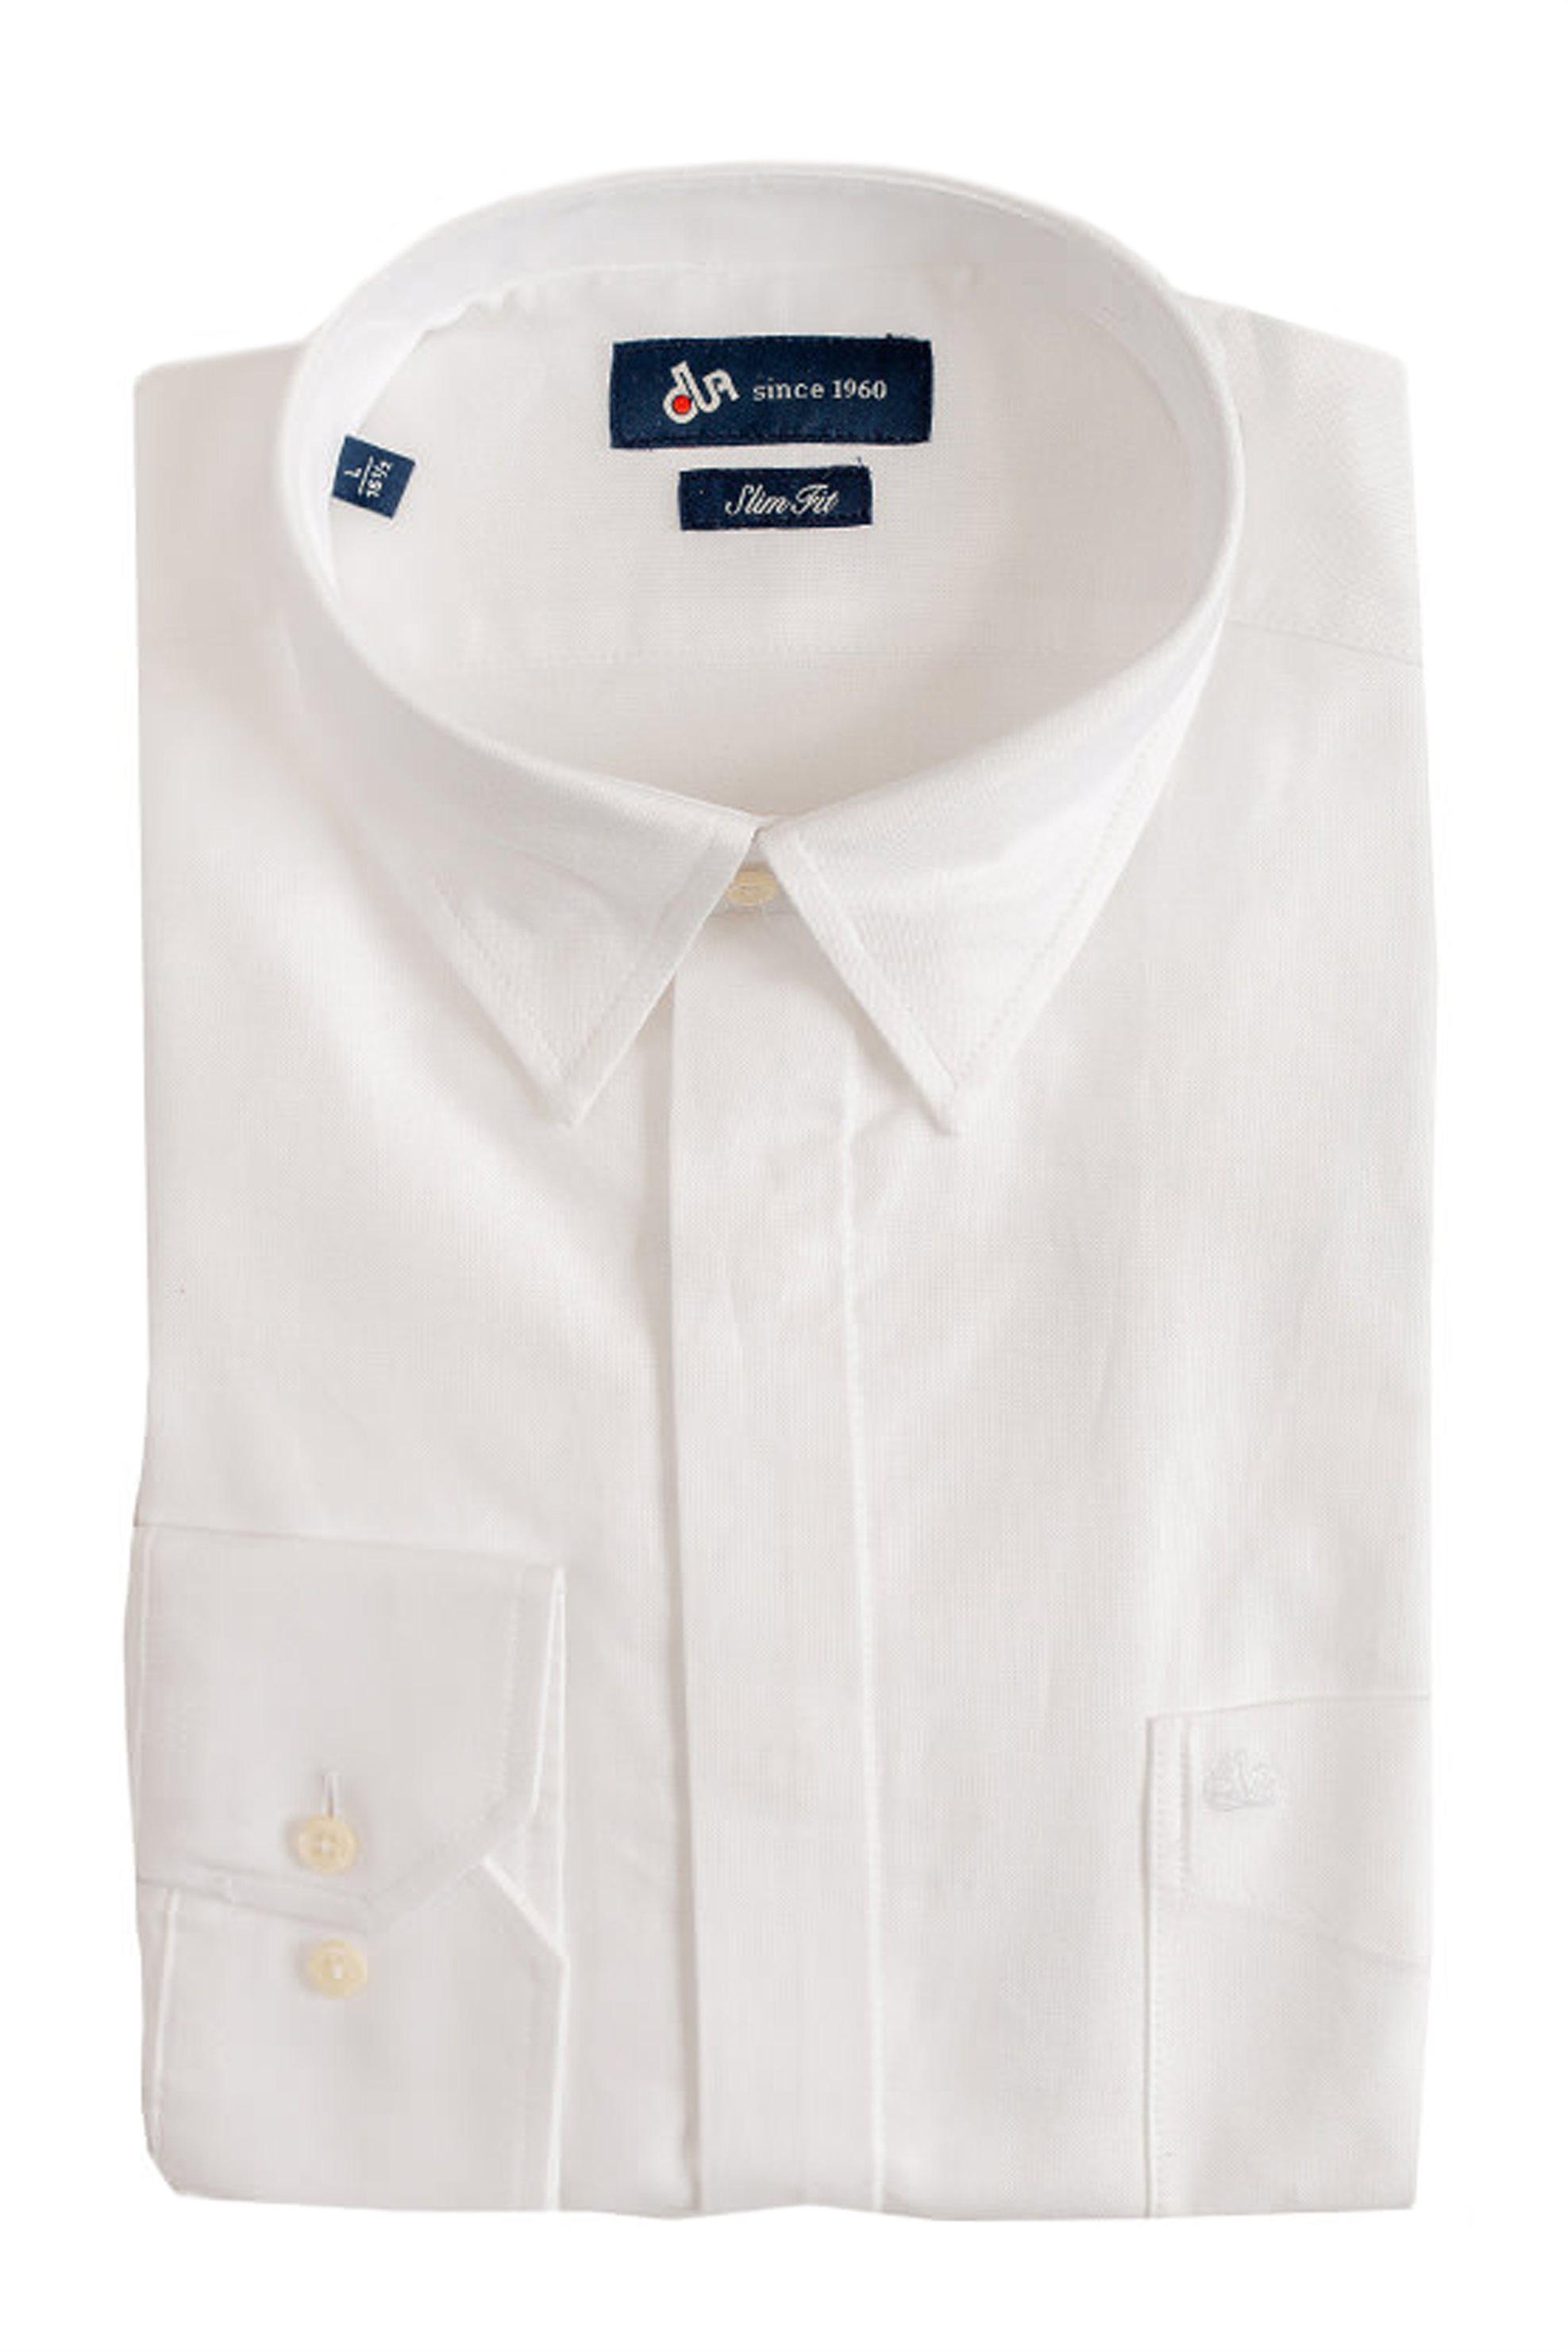 68e2b217b4c4 Dur ανδρικό μονόχρωμο πουκάμισο Oxford σε στενή γραμμή - 10020638 - Λευκό